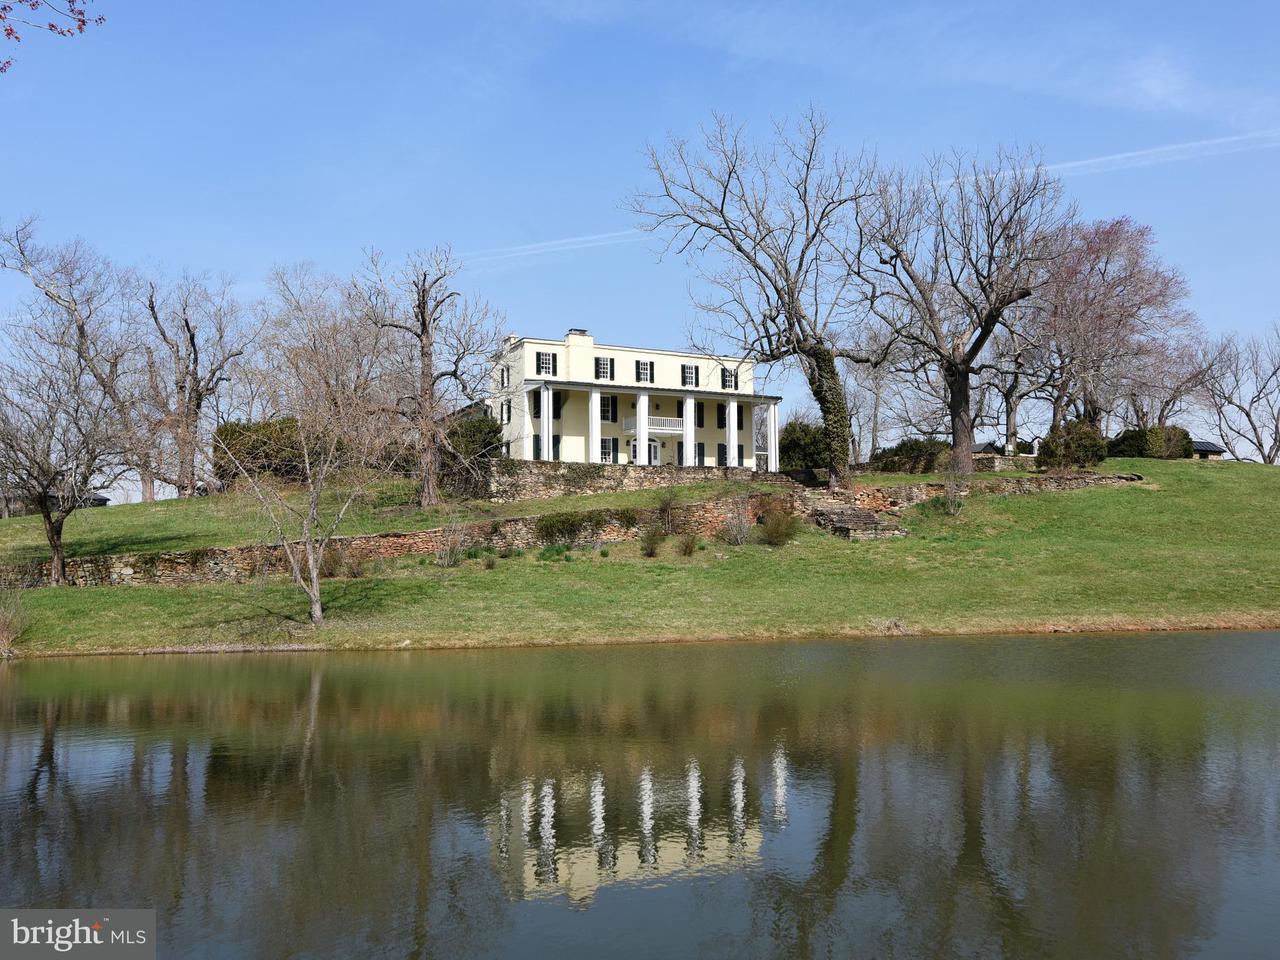 独户住宅 为 销售 在 2546 Halfway Road 2546 Halfway Road 普莱恩斯, 弗吉尼亚州 20198 美国